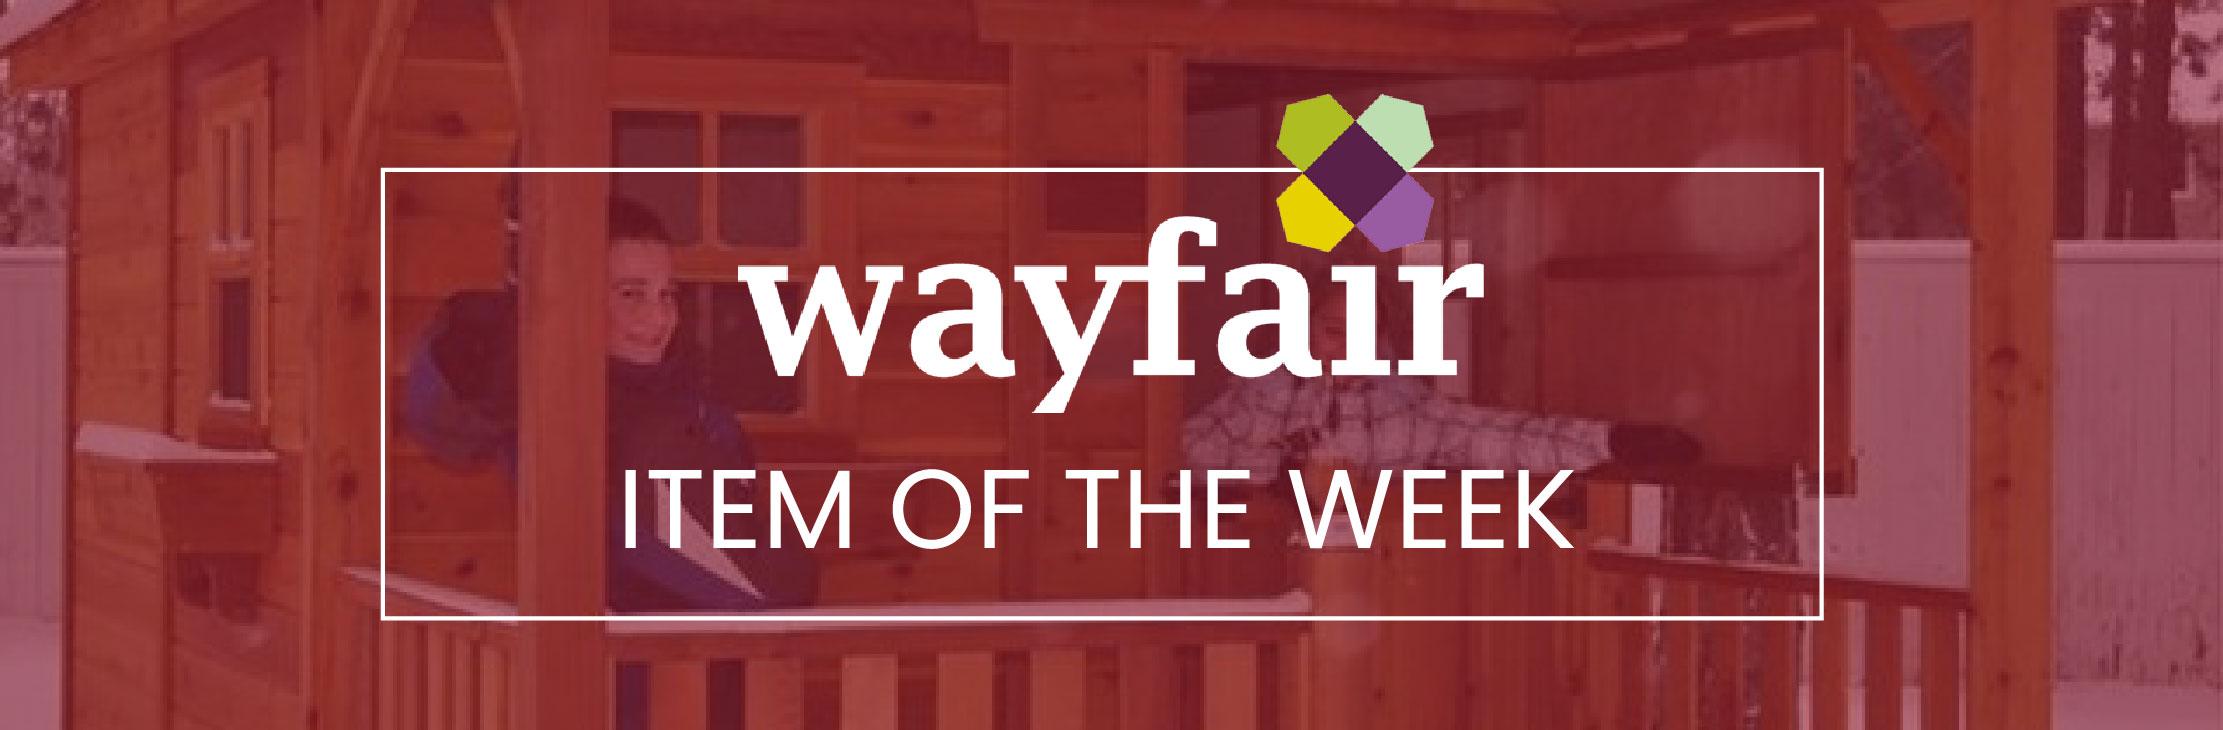 Wayfairitem-of-the-week-super-shed